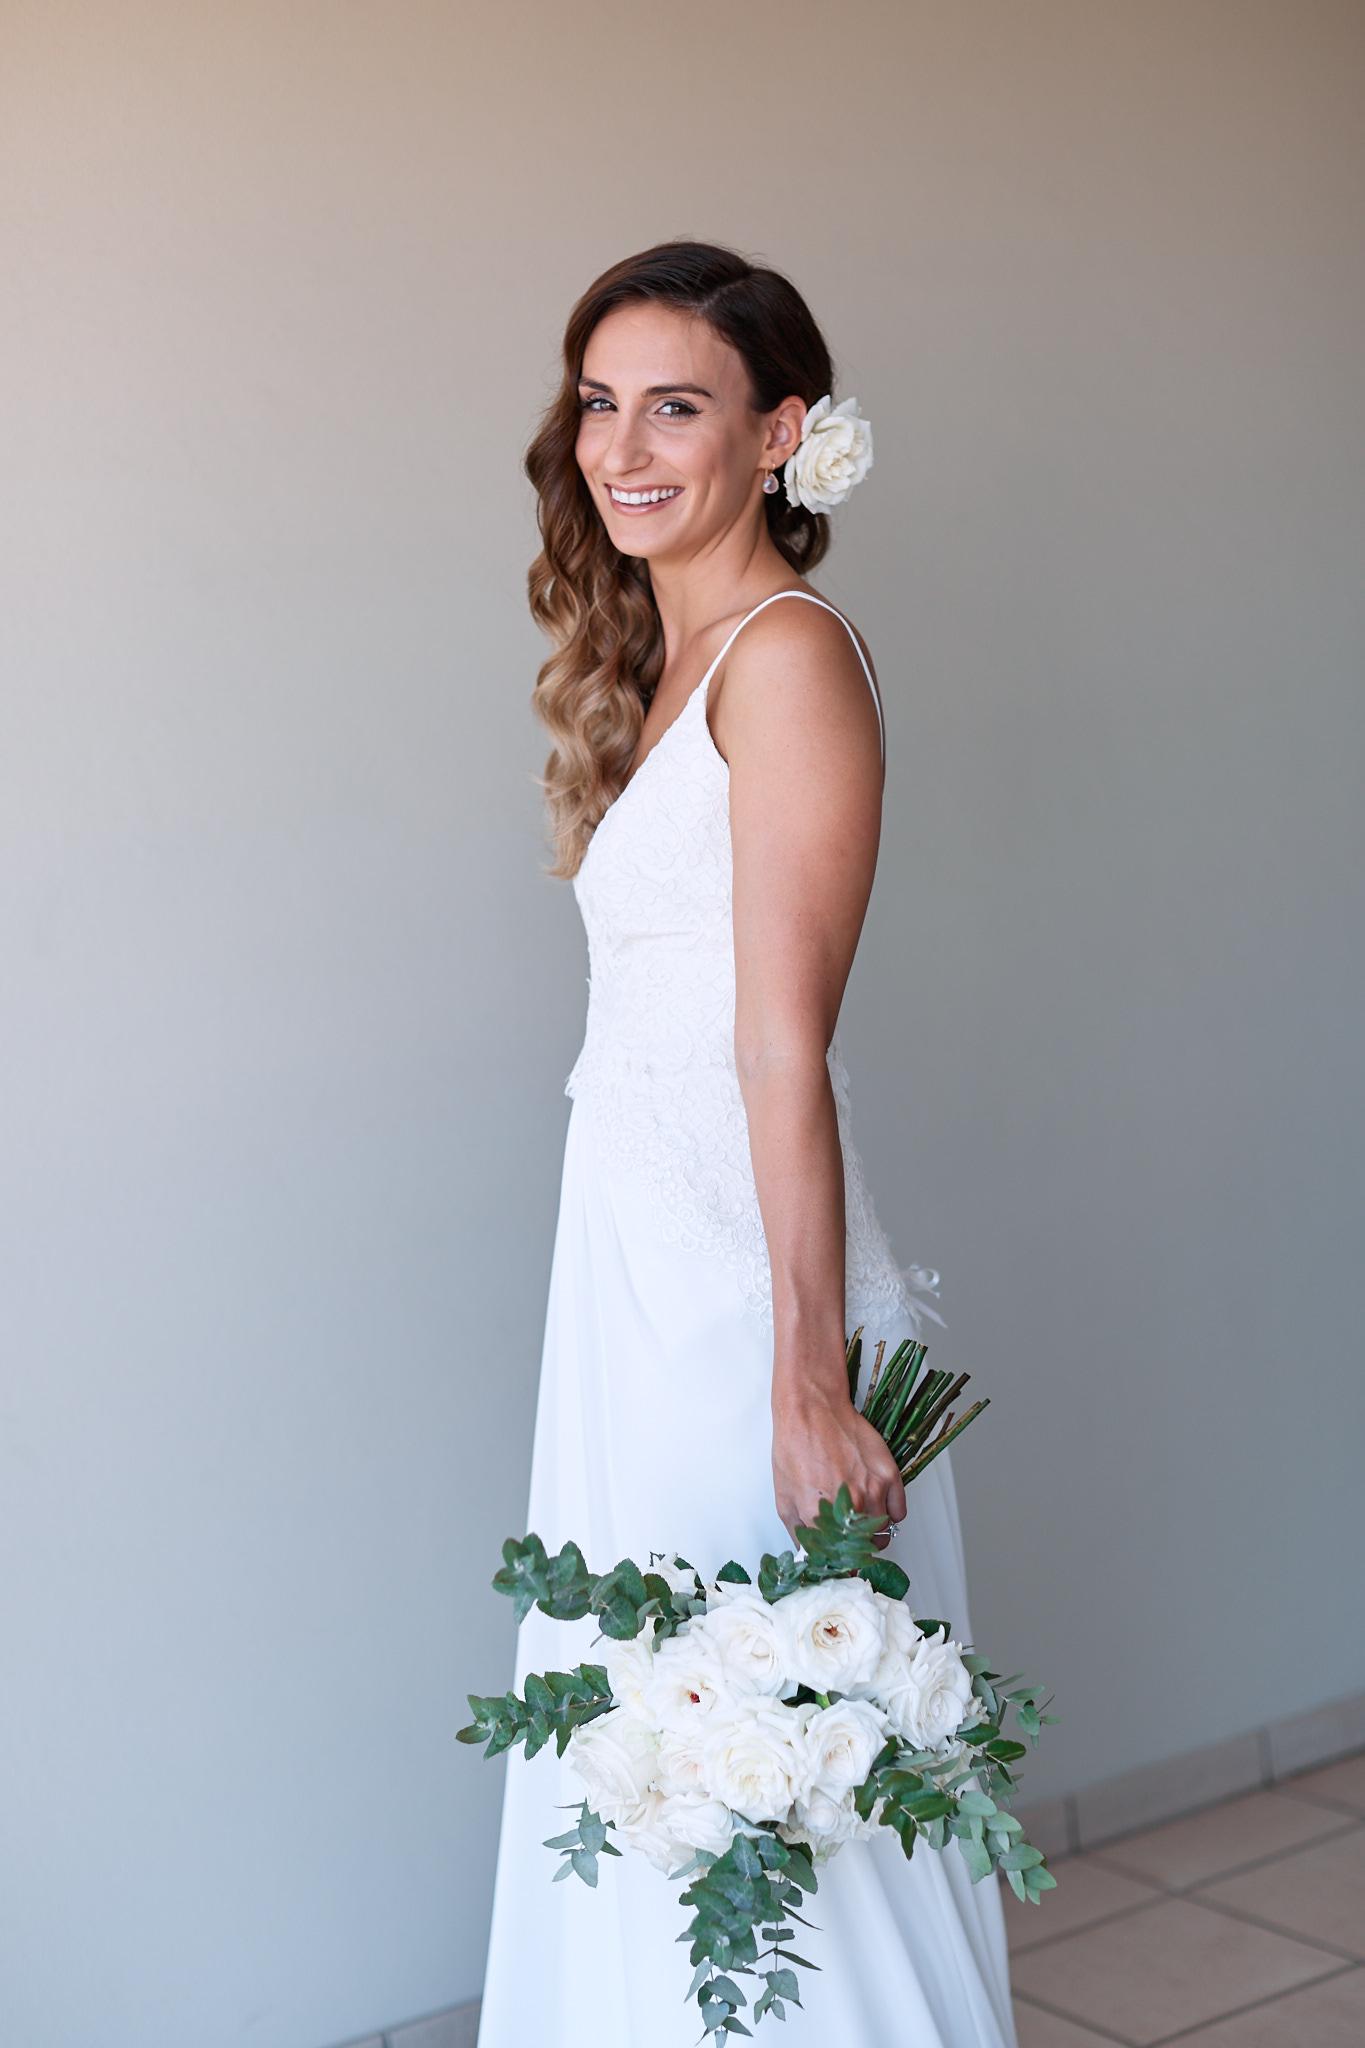 bride standing with bouquet.jpg